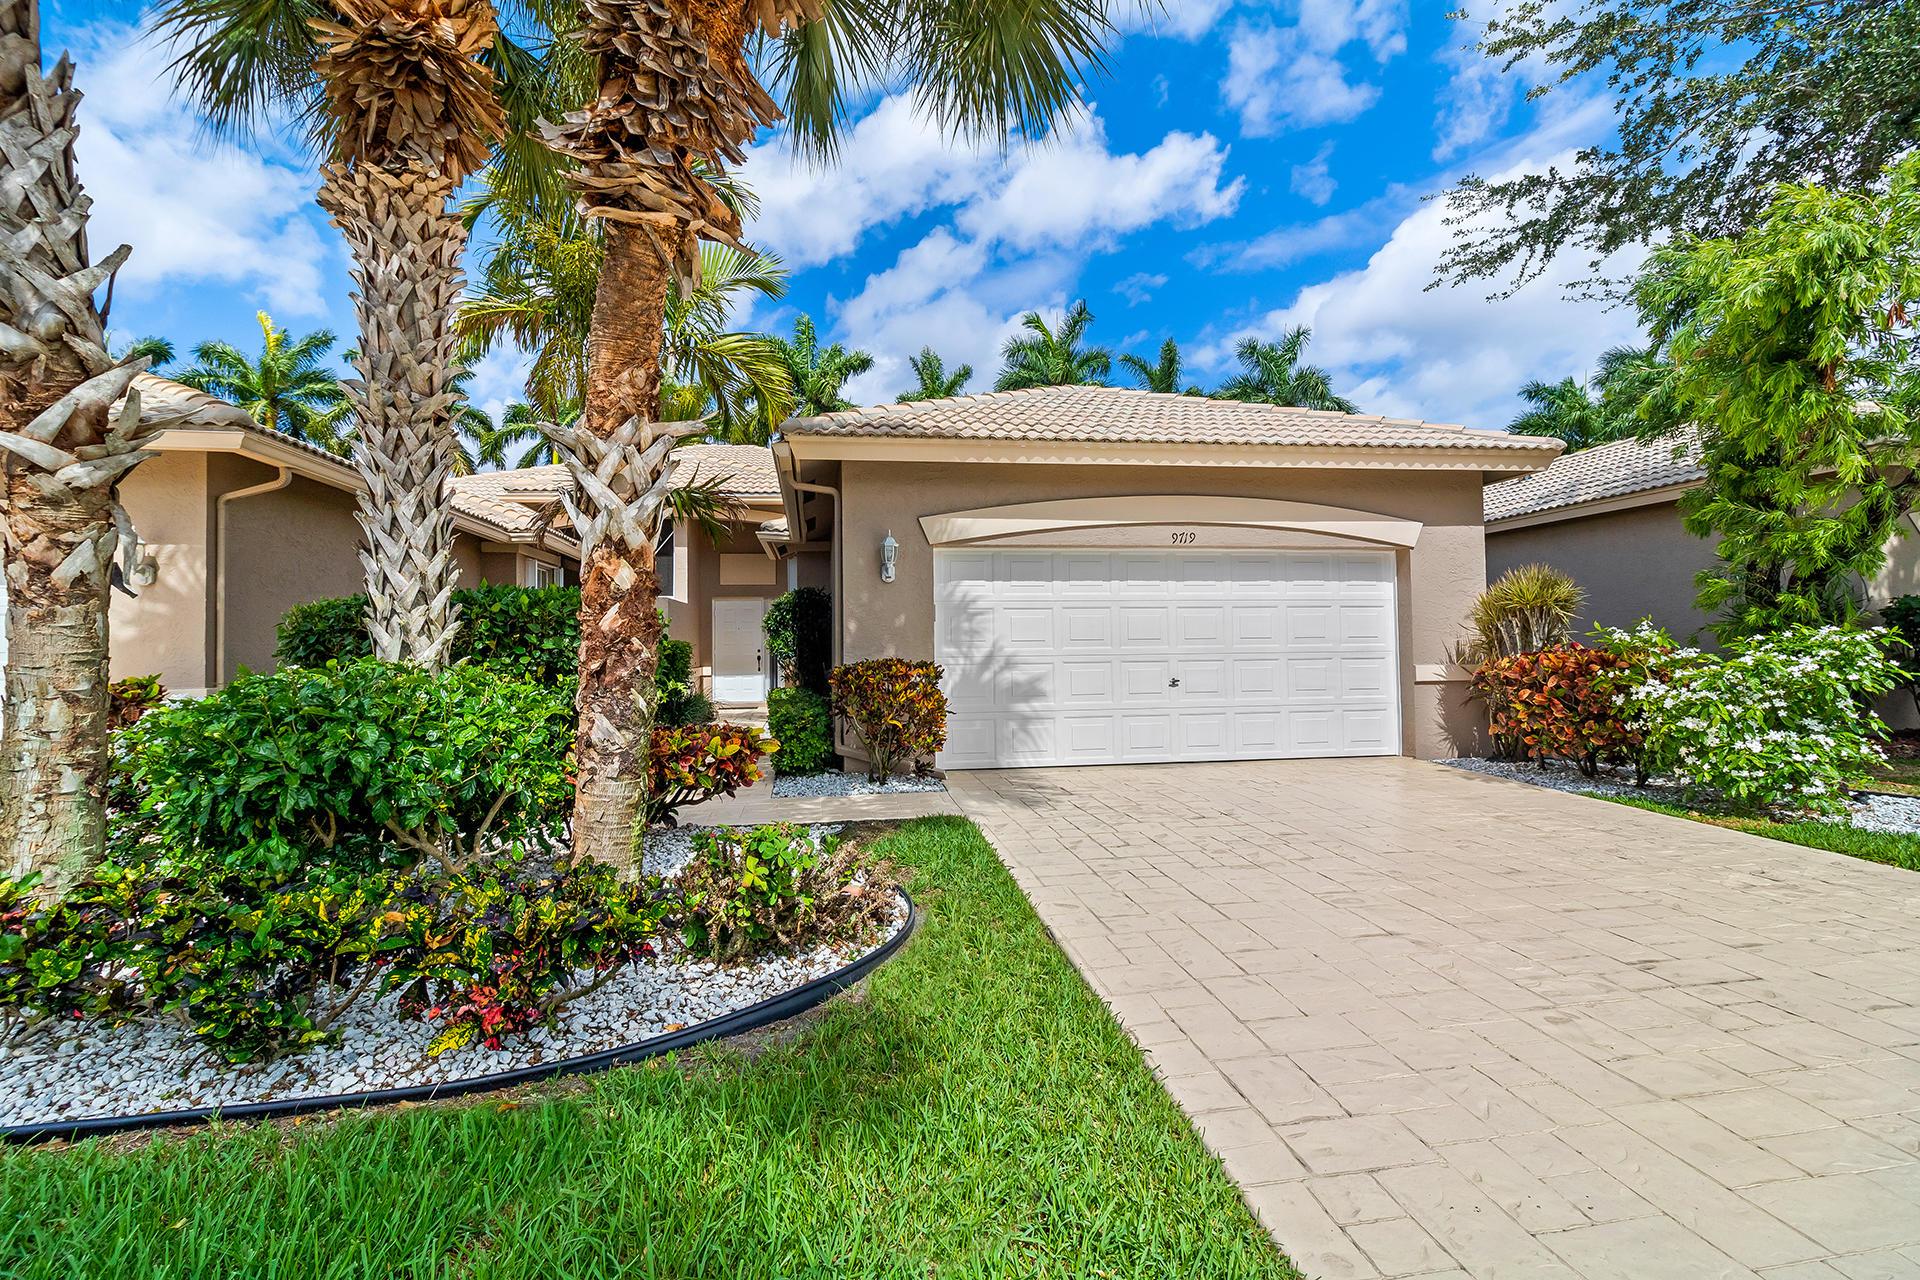 Photo of 9719 Crescent View Drive S, Boynton Beach, FL 33437